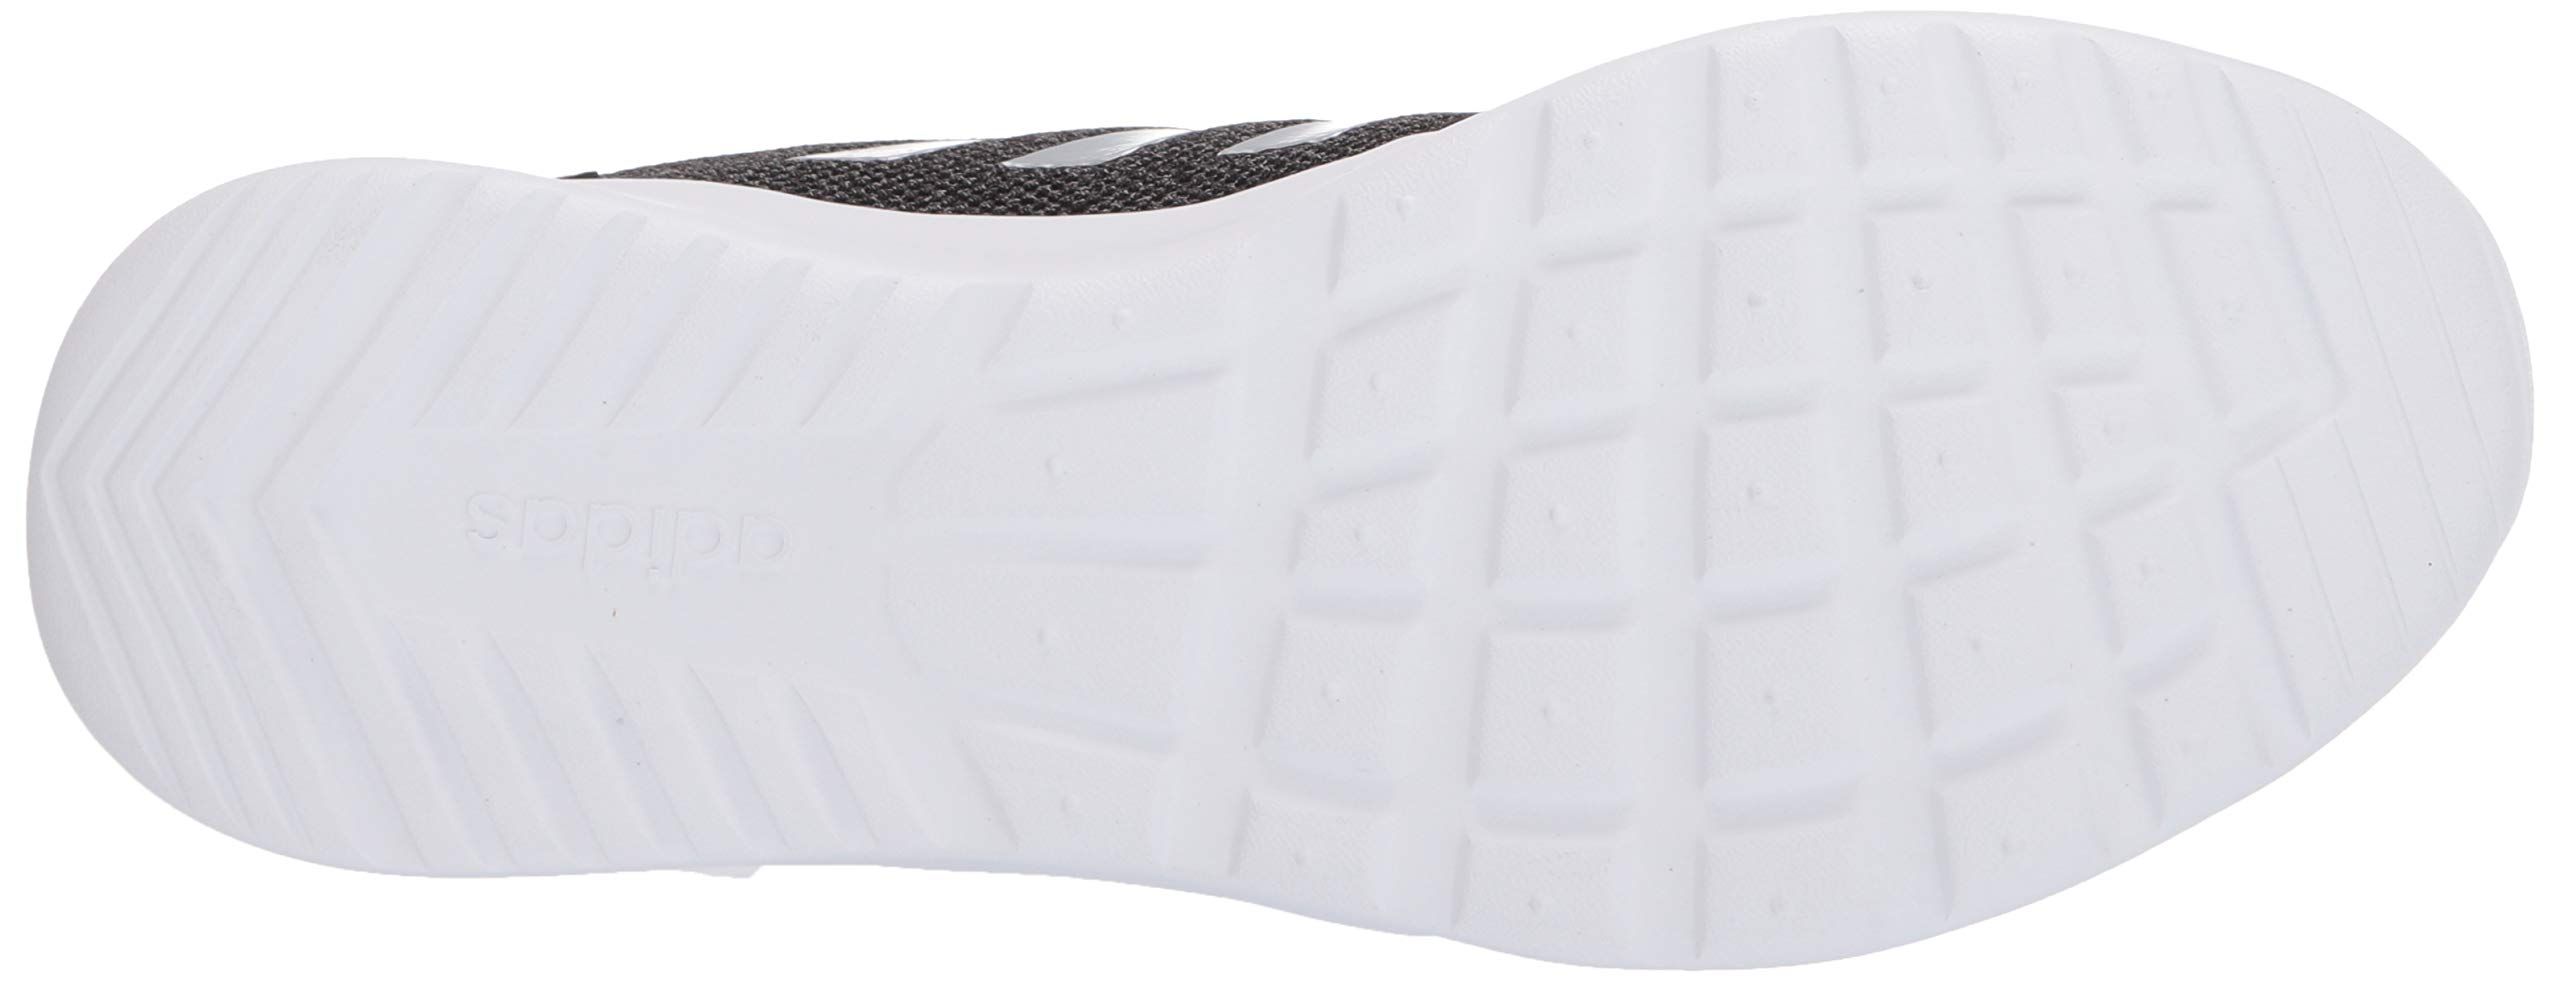 adidas Women's Cloudfoam Qt Racer Sneaker, Black/Silver Metallic/Grey, 5.5 M US by adidas (Image #3)